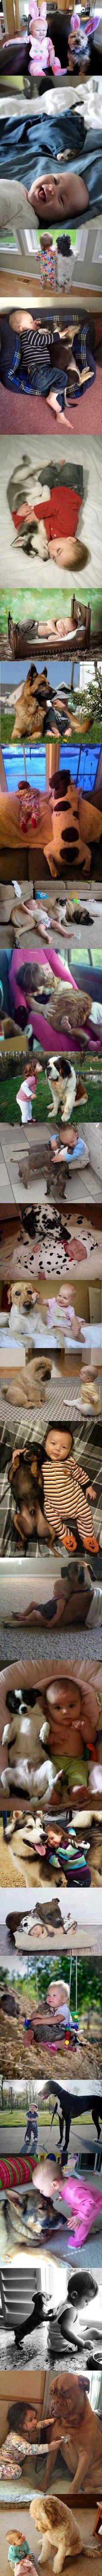 fotos hijo mascota